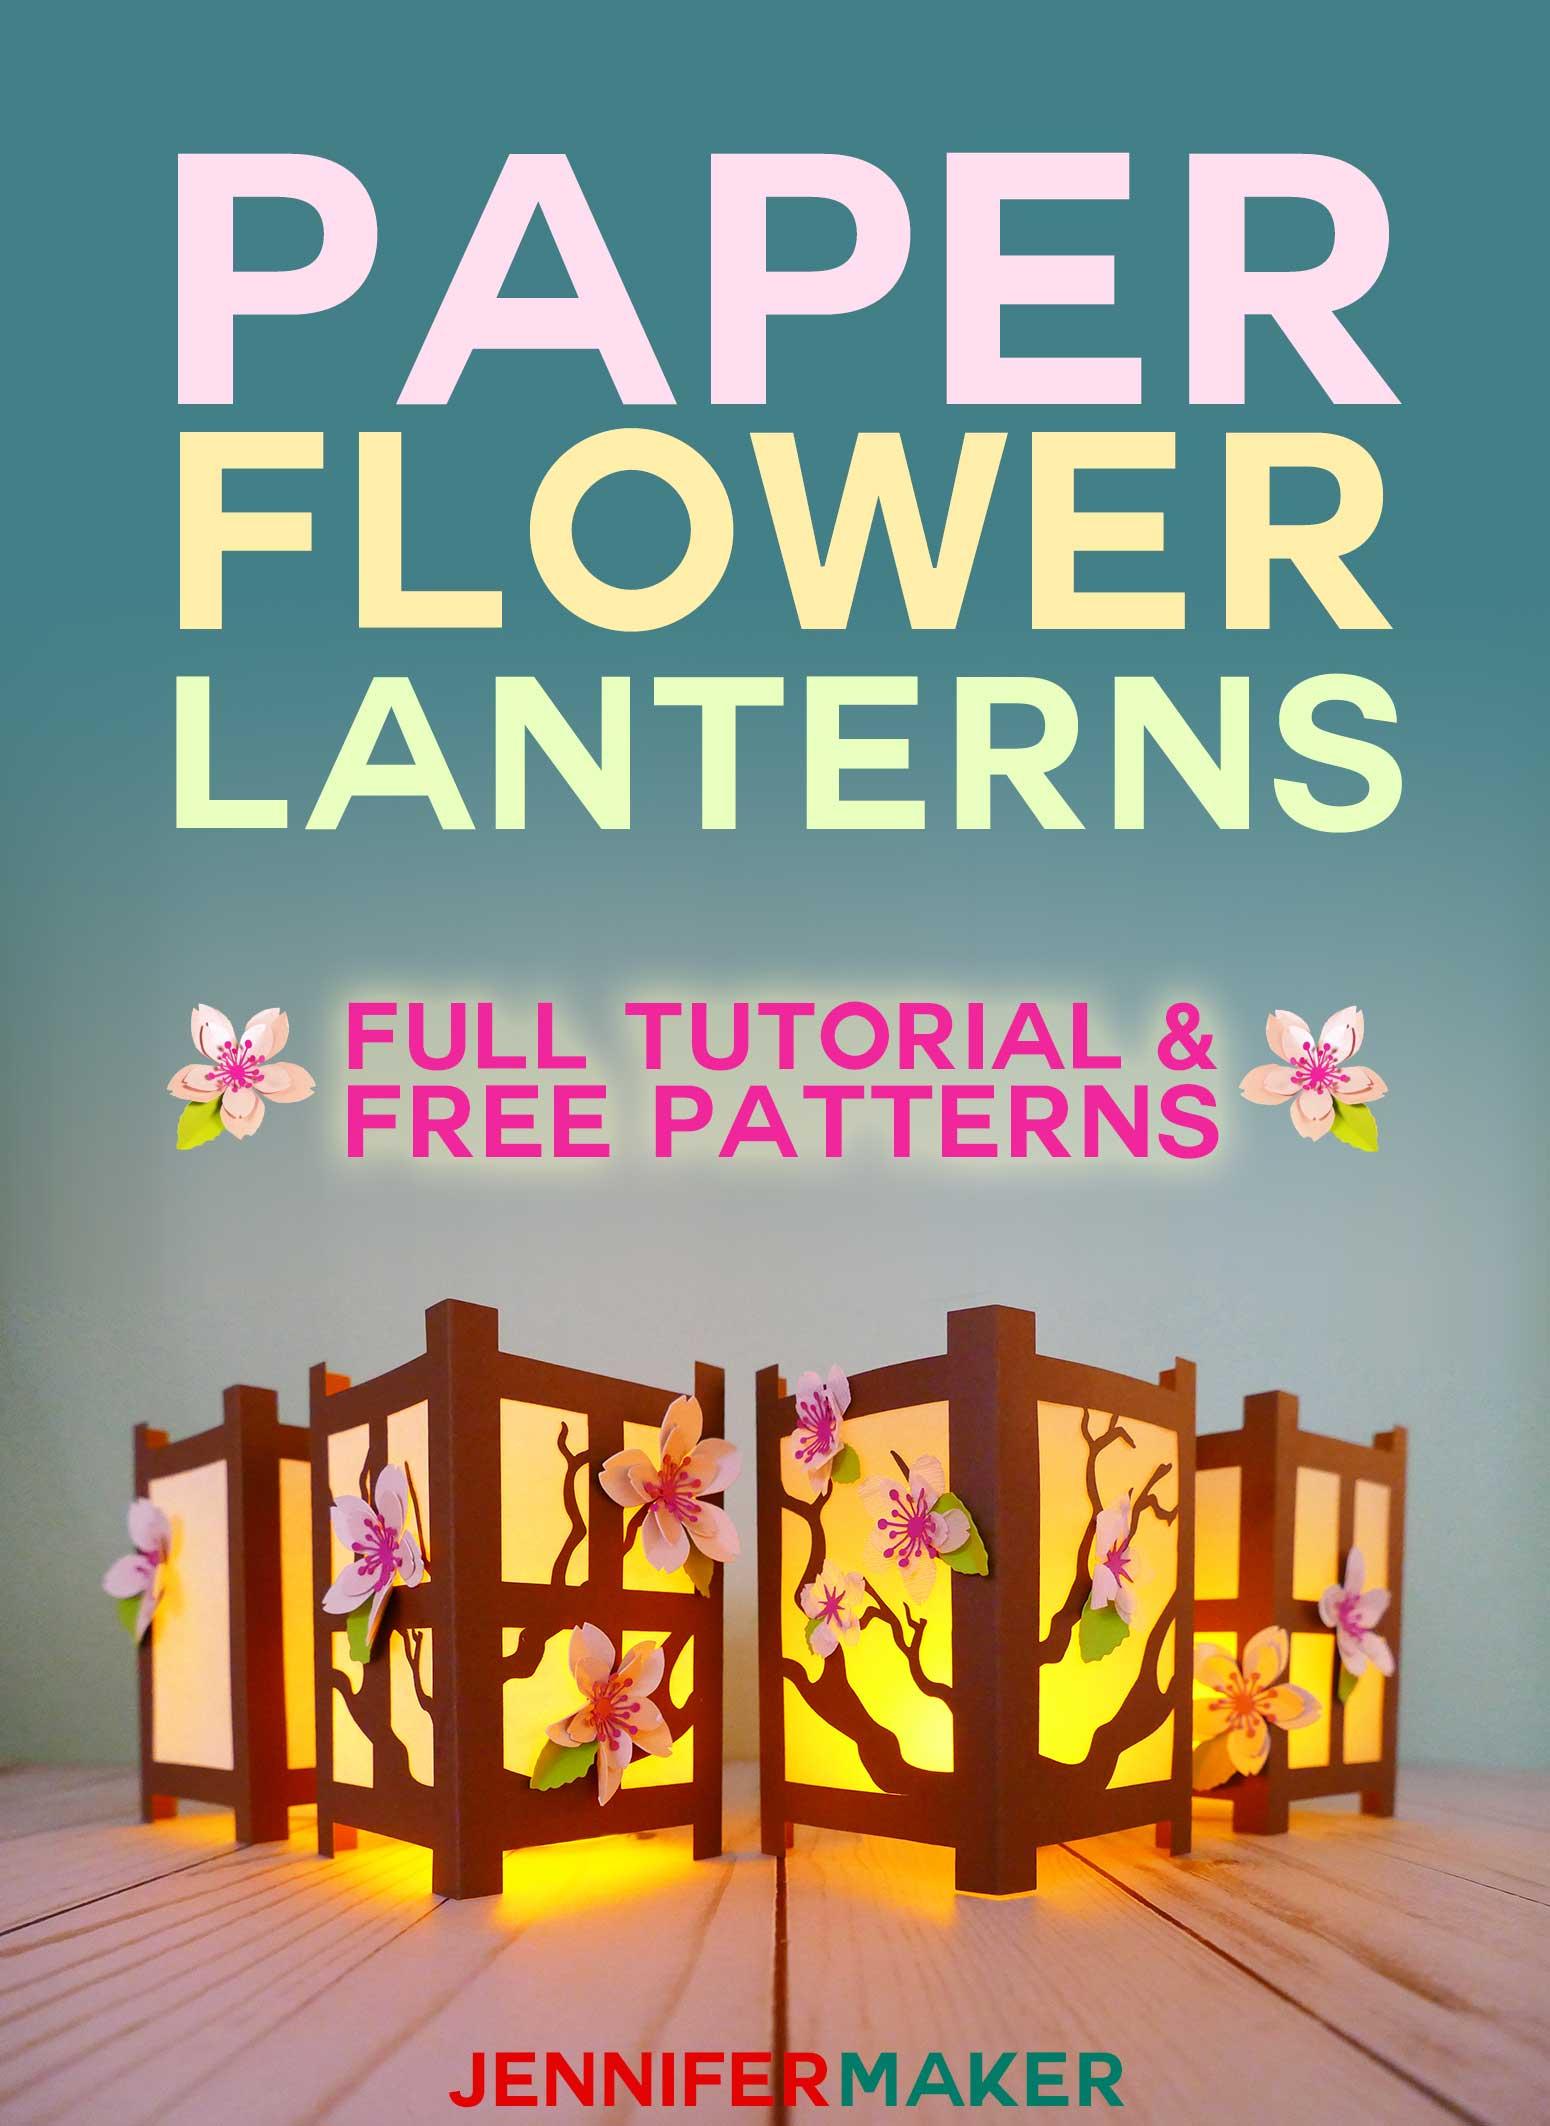 Paper Flower Lanterns designed after a Japanese shoji rice paper screen   Free svg cut files and pattern #paperflowers #lanterns #cricut